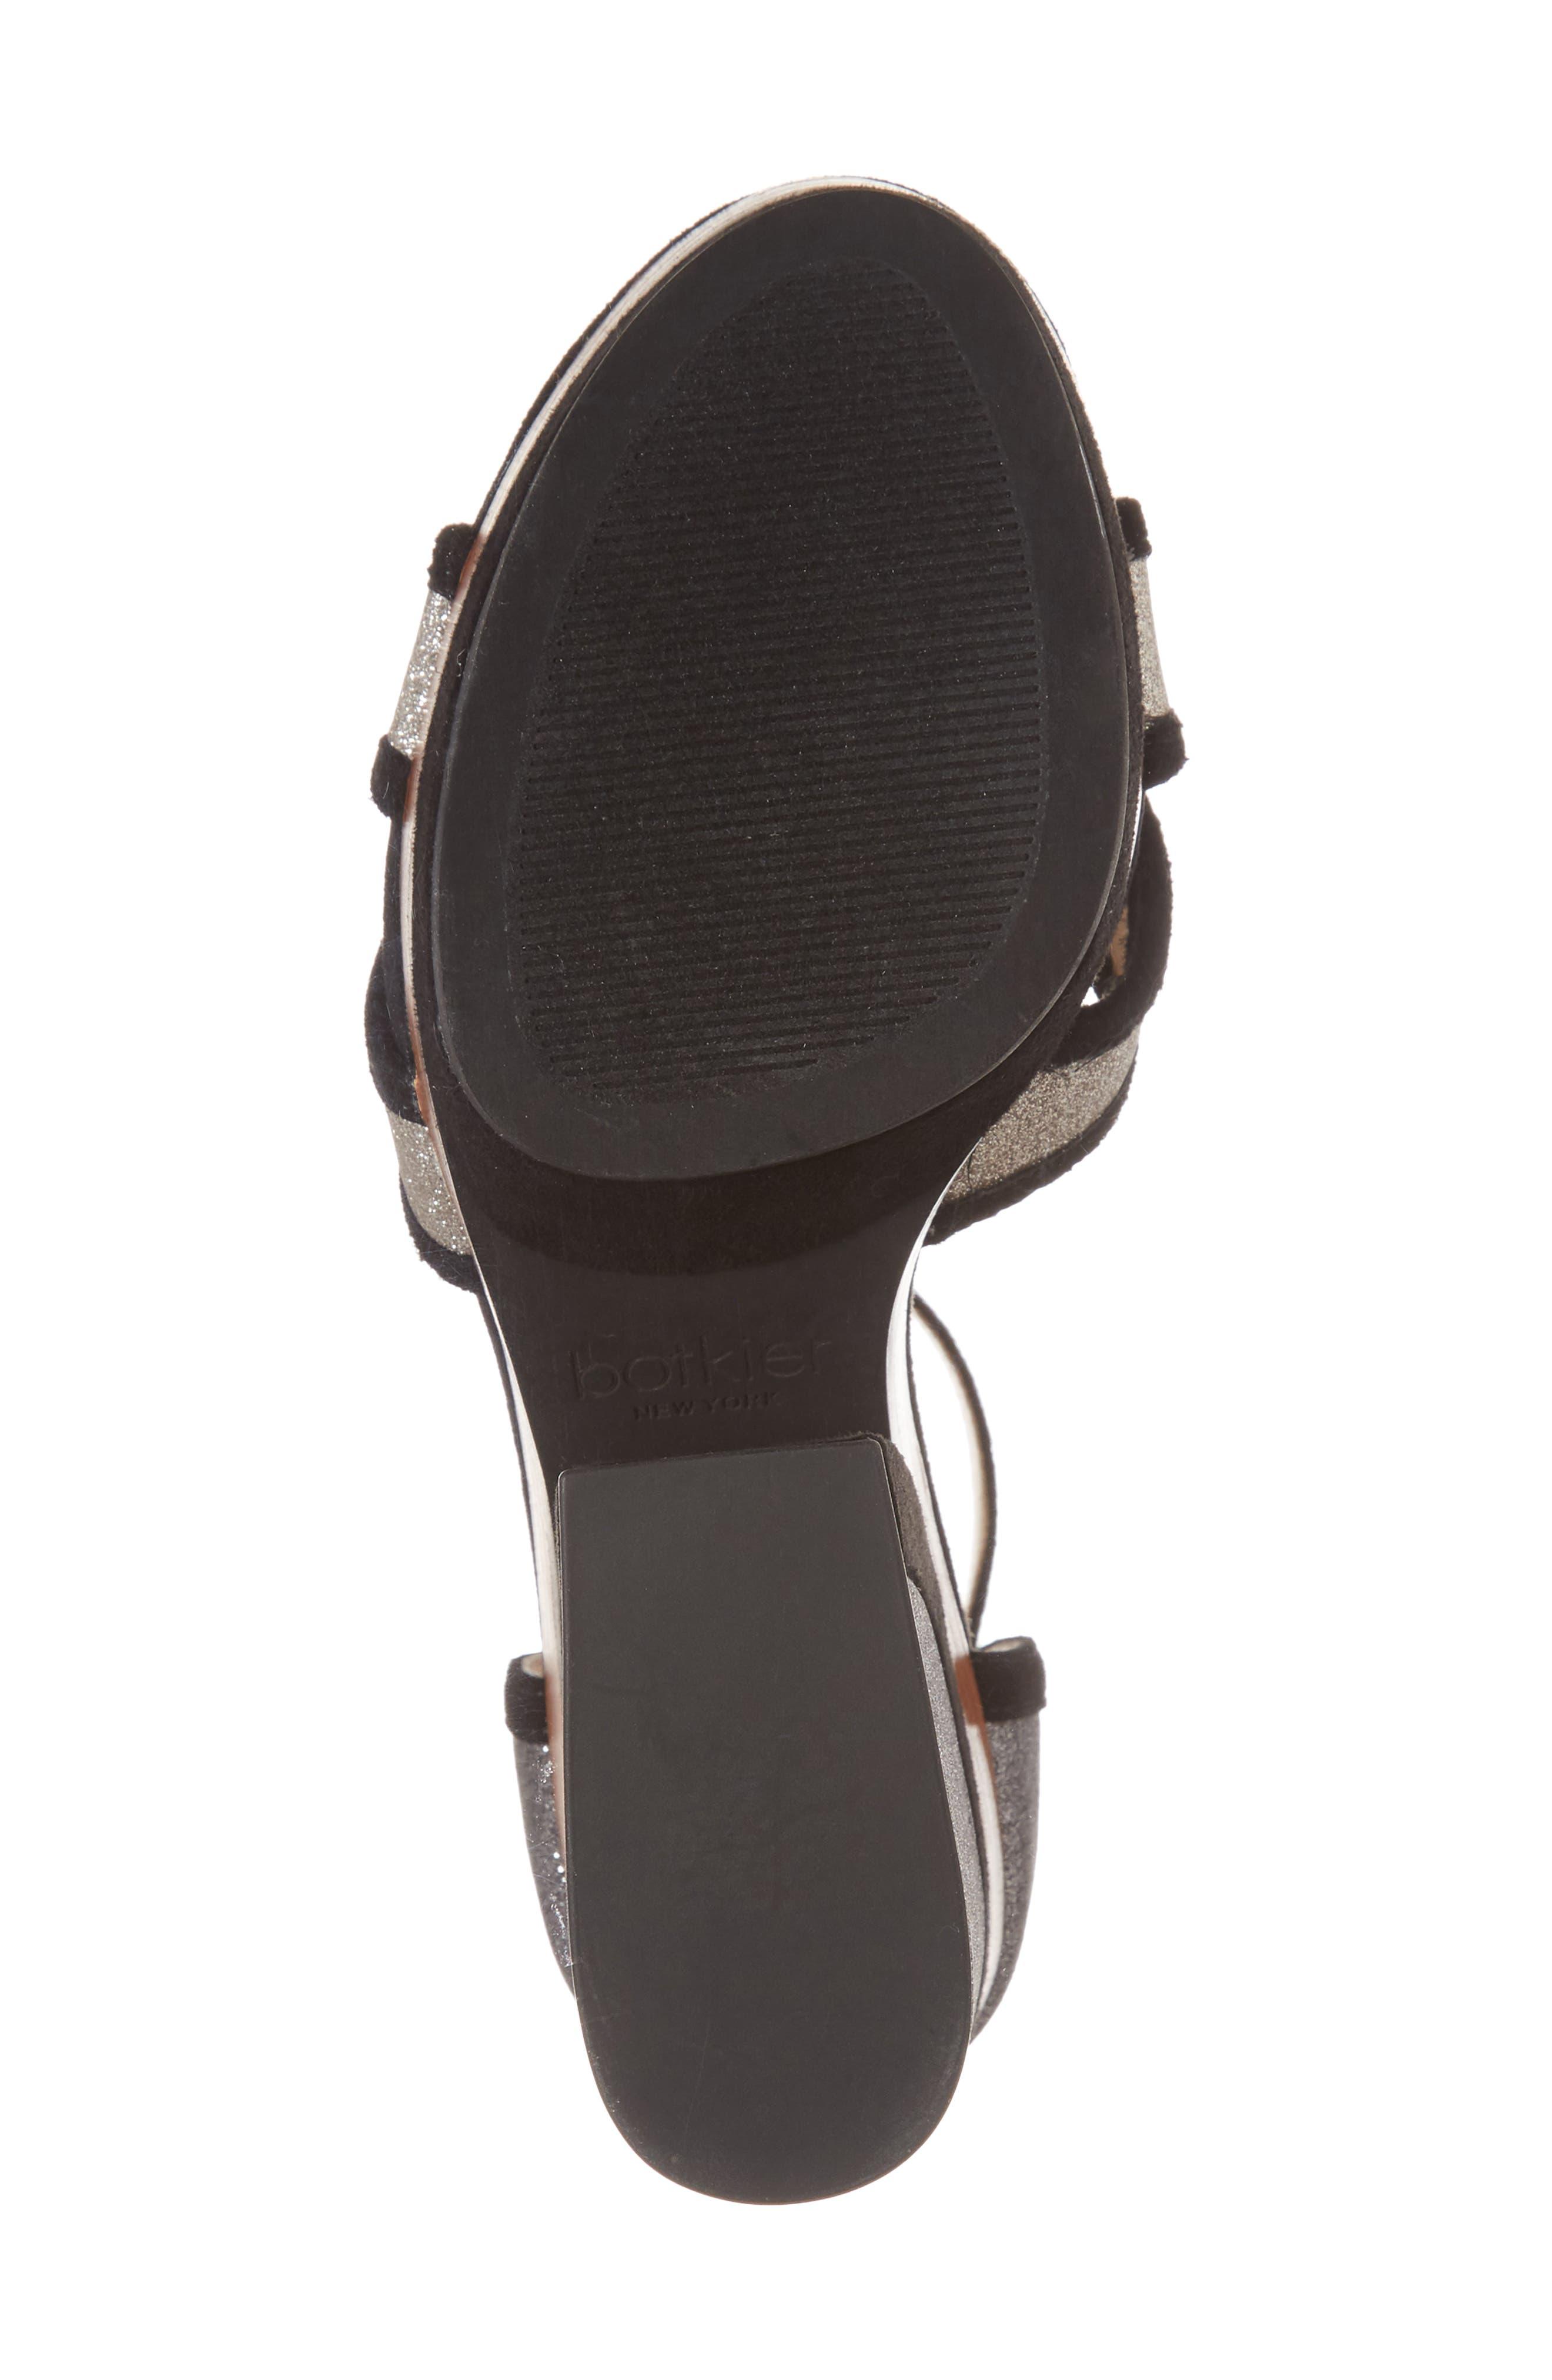 Paloma Ankle Strap Sandal,                             Alternate thumbnail 6, color,                             GUNMETAL GLITTER